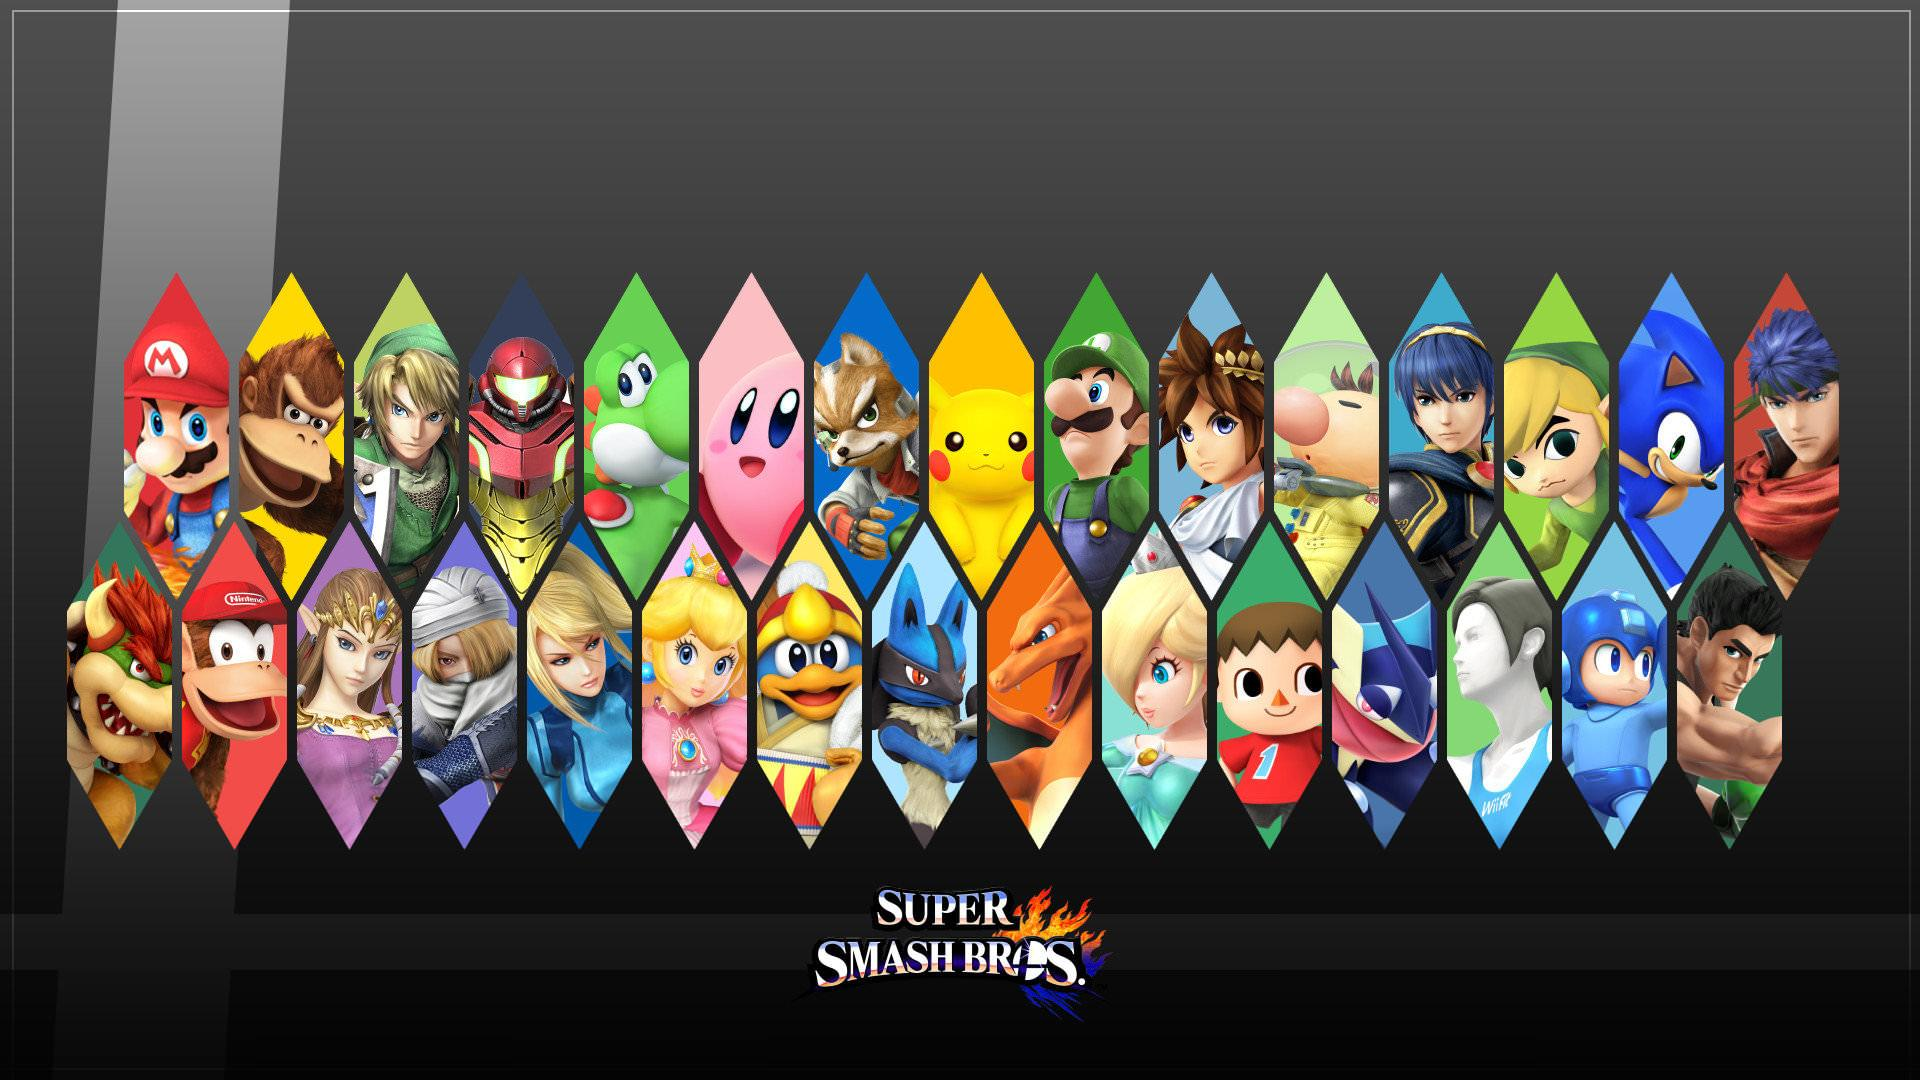 Super Smash Bros Ultimate Hd Wallpapers Wallpaper Cave